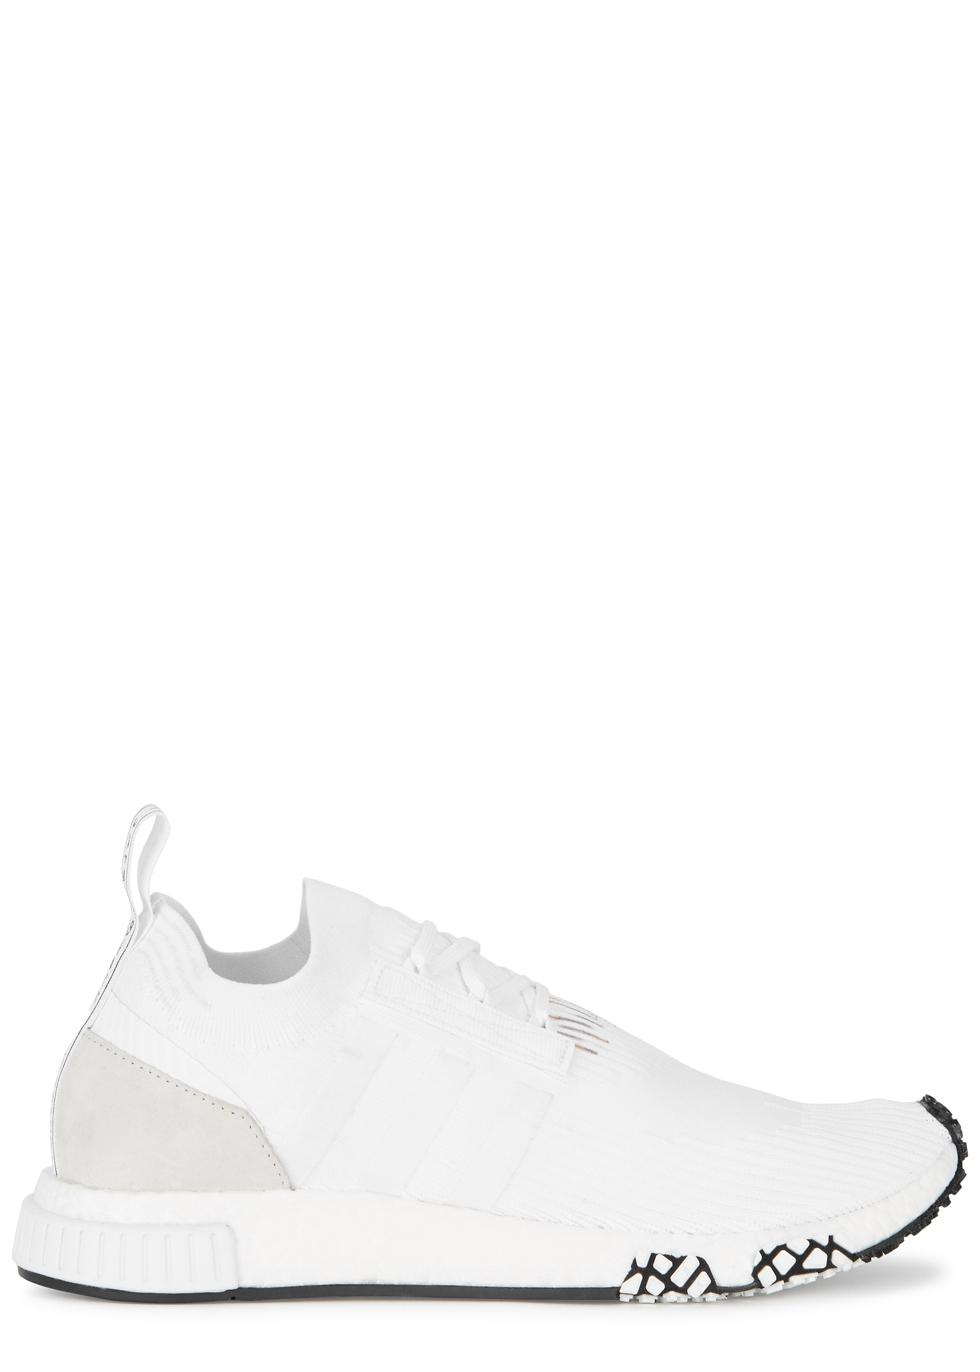 980x1372 Adidas Originals Nmd Racer White Primeknit Trainers